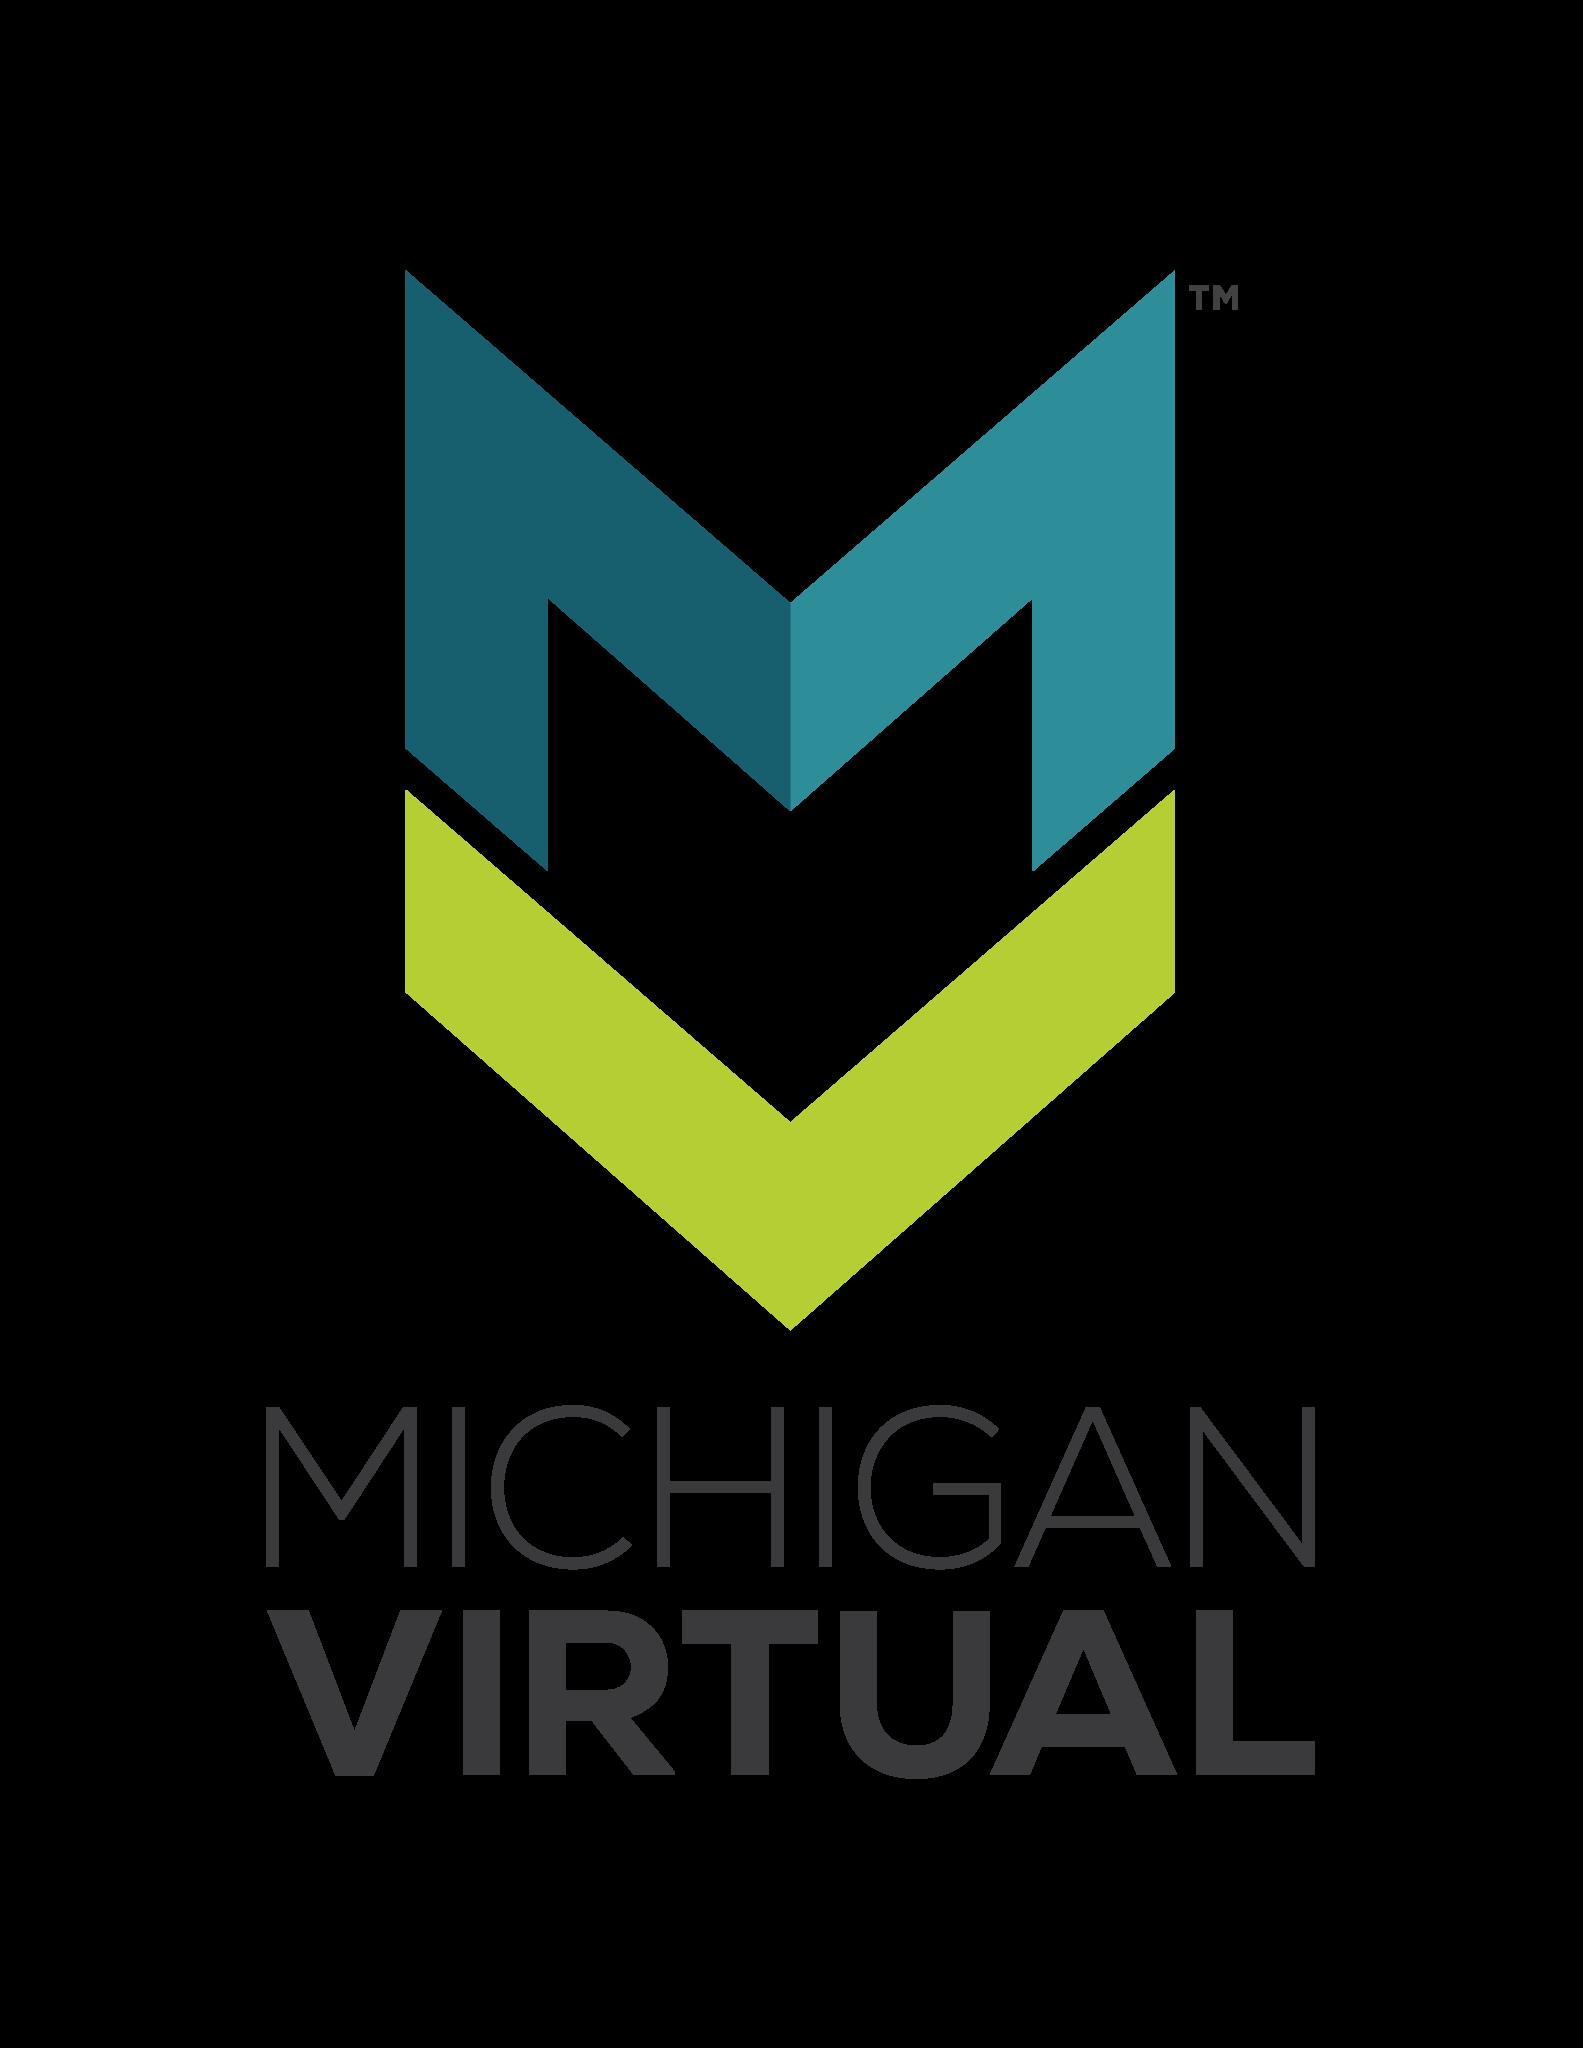 Michigan Virtual Logo (Vertical Stacked)